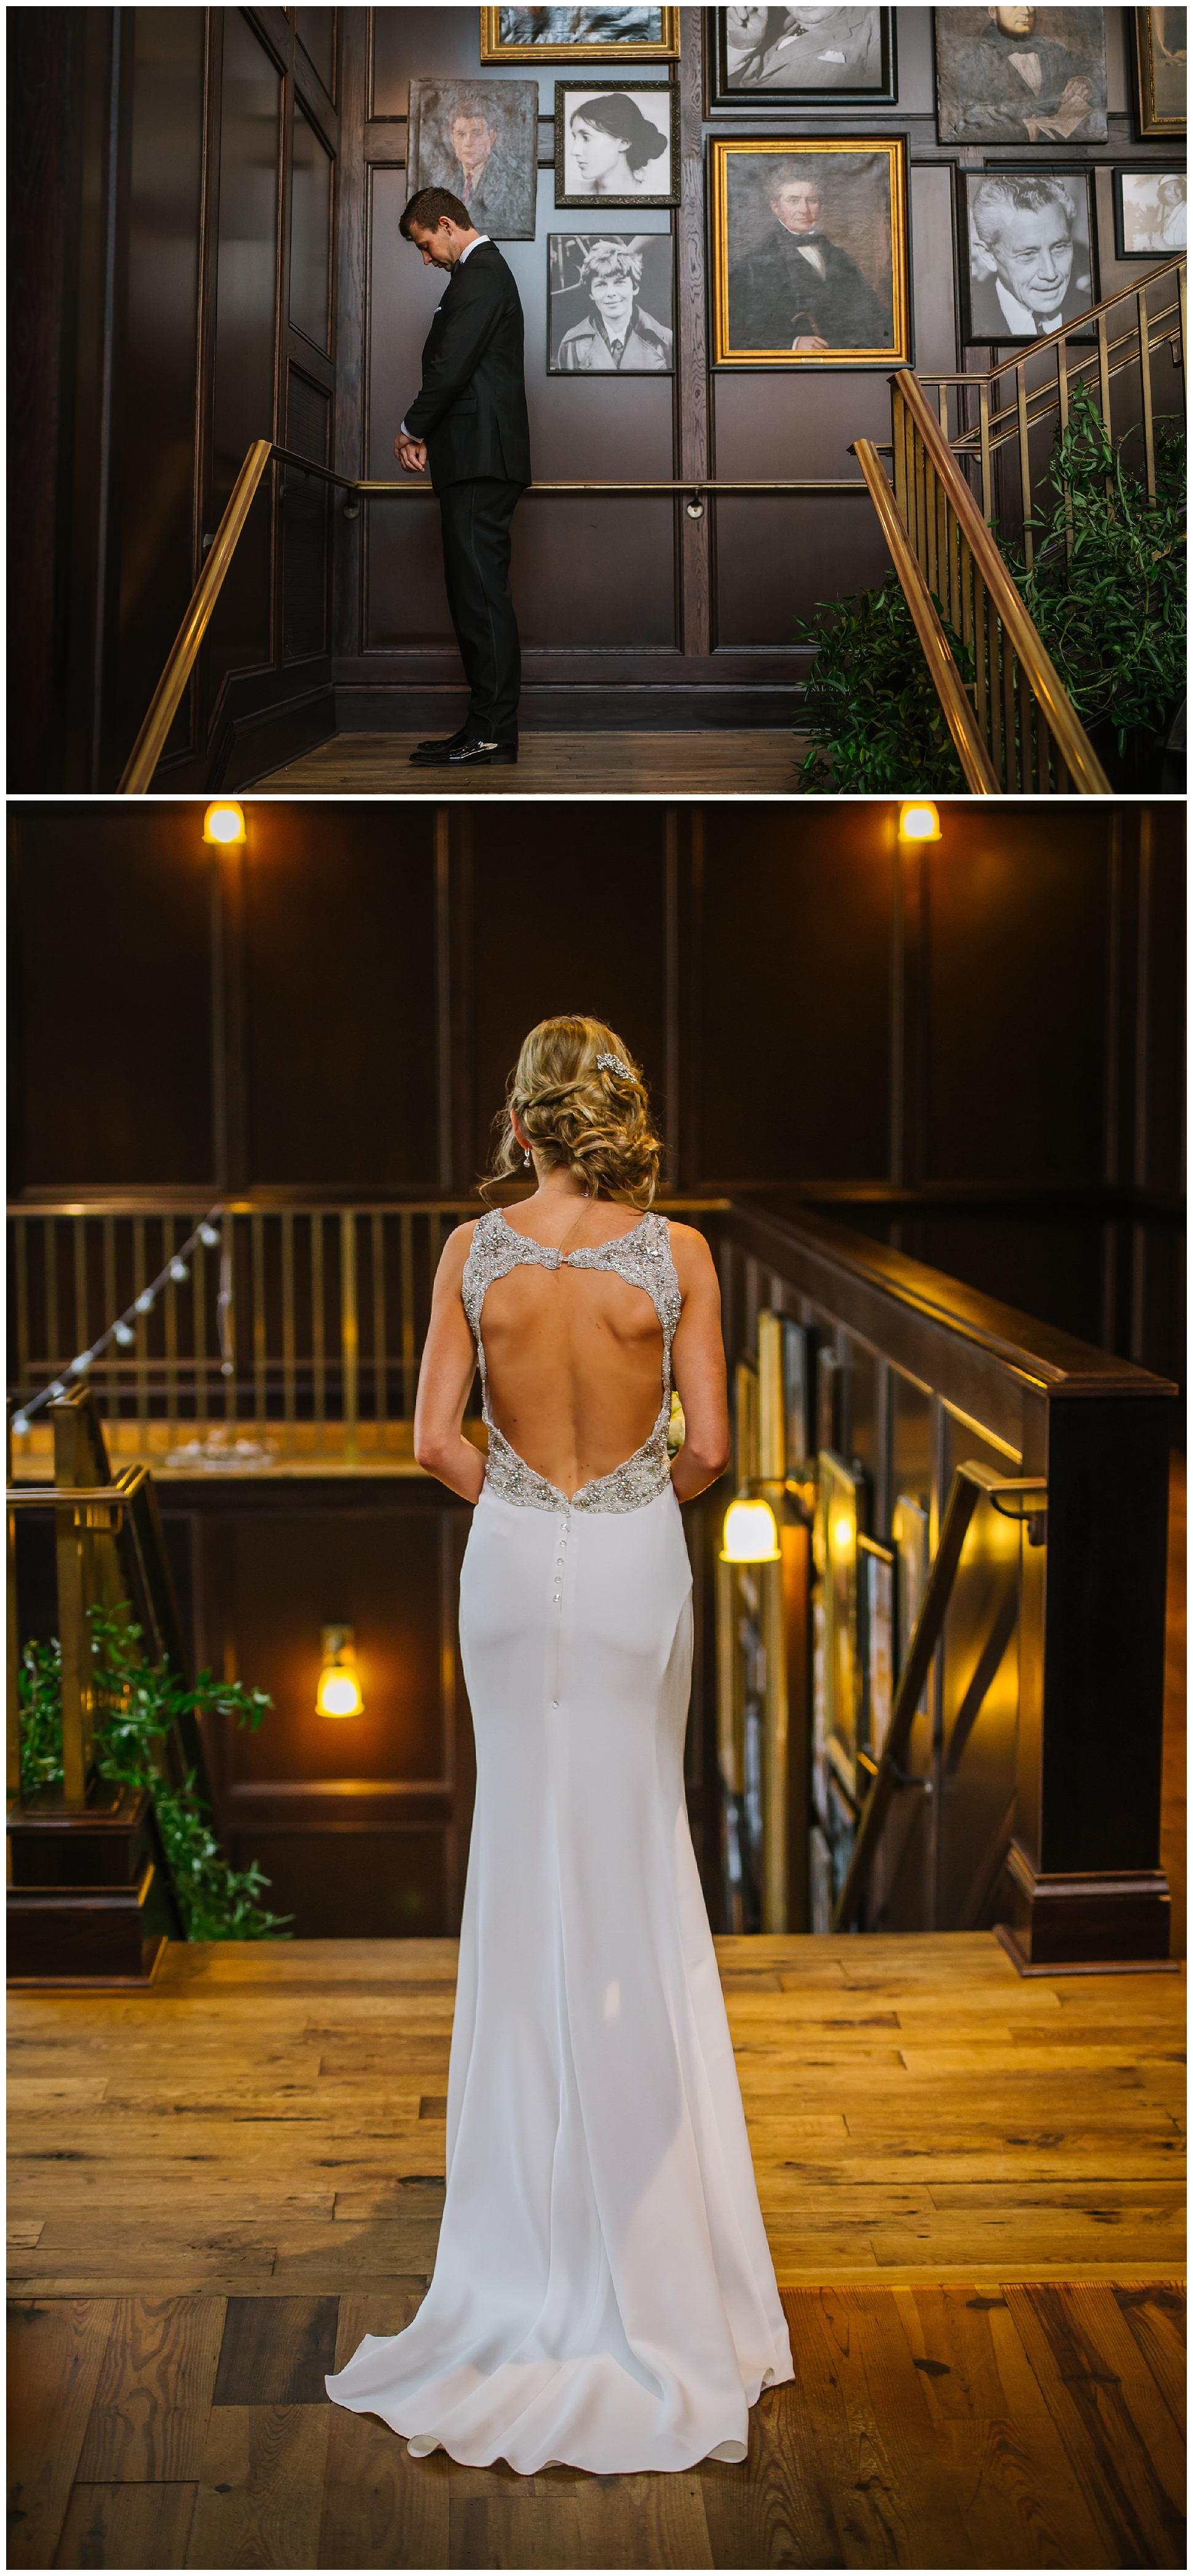 Oxford-exchange-wedding-photogapher-garland-candels-bookstore-burgandy-botanica_0025.jpg